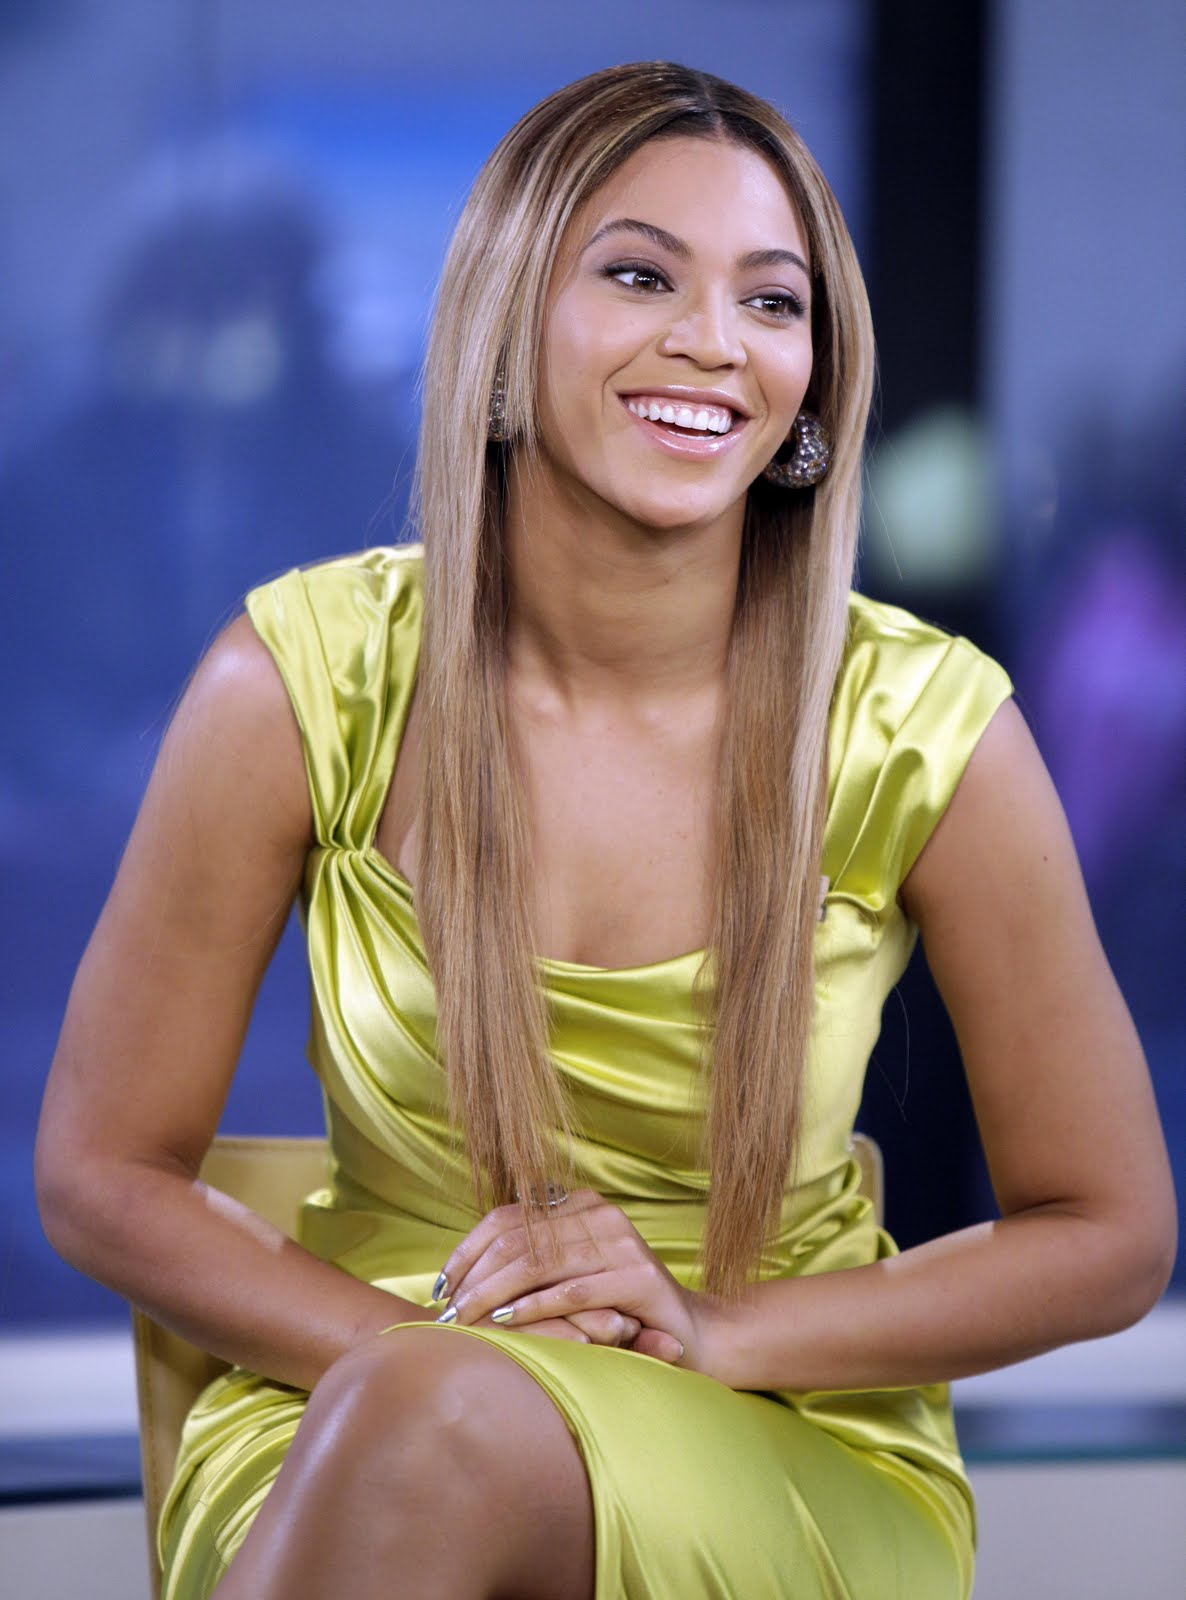 http://3.bp.blogspot.com/-Tjg8GOPx1Go/TmPV3tyDfRI/AAAAAAAAAhY/4X-kguplPcM/s1600/Beyonce-Knowles-pics-images-songs-lyrics-photos-films-movies-pictures-singlelady+%25285%2529.jpg